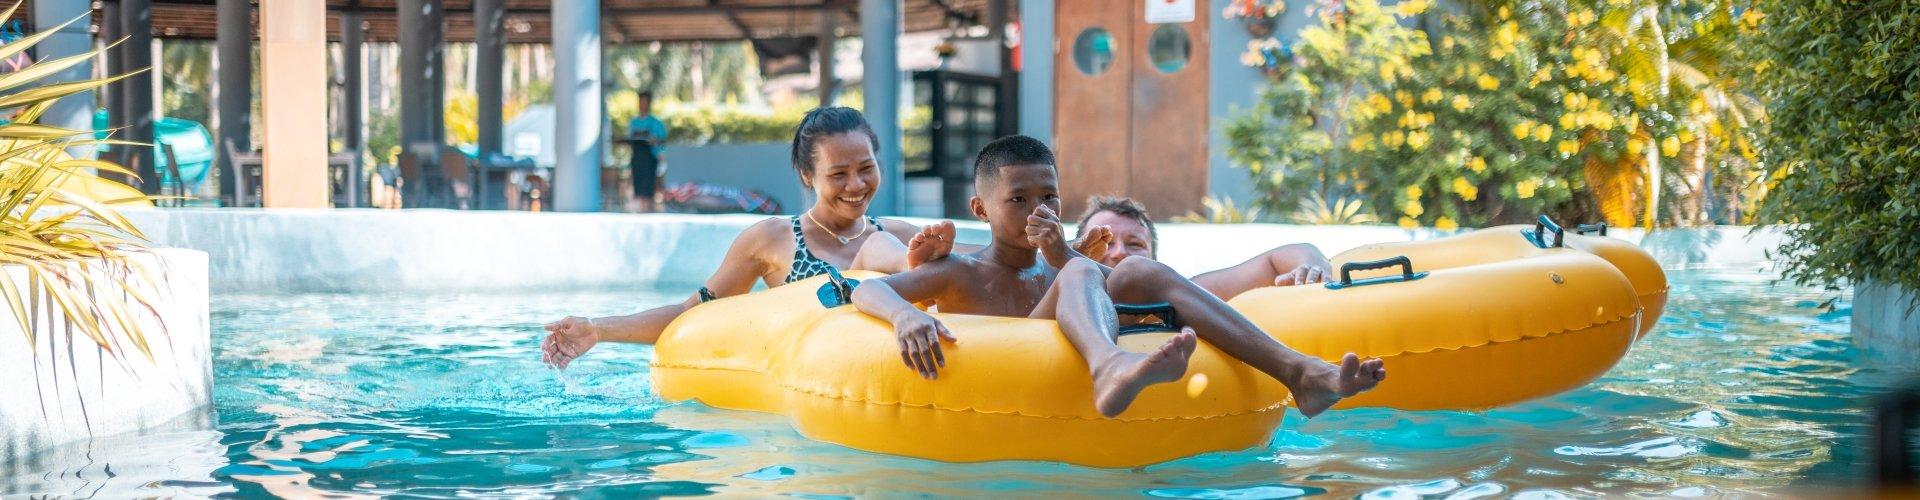 Ausflugsziel Acqua Plus Water Park